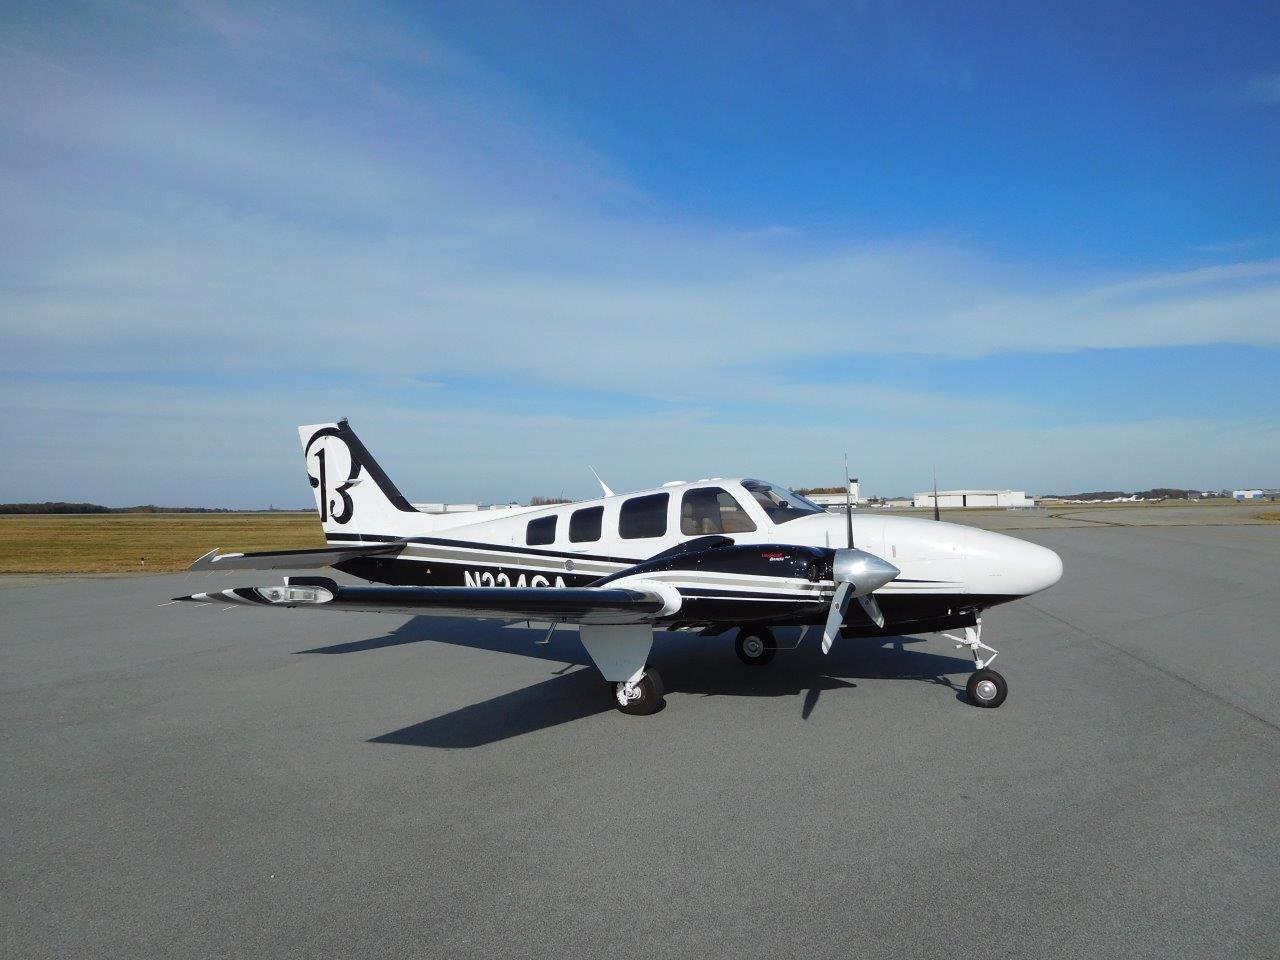 Aircraft Listing - Baron G58 listed for sale